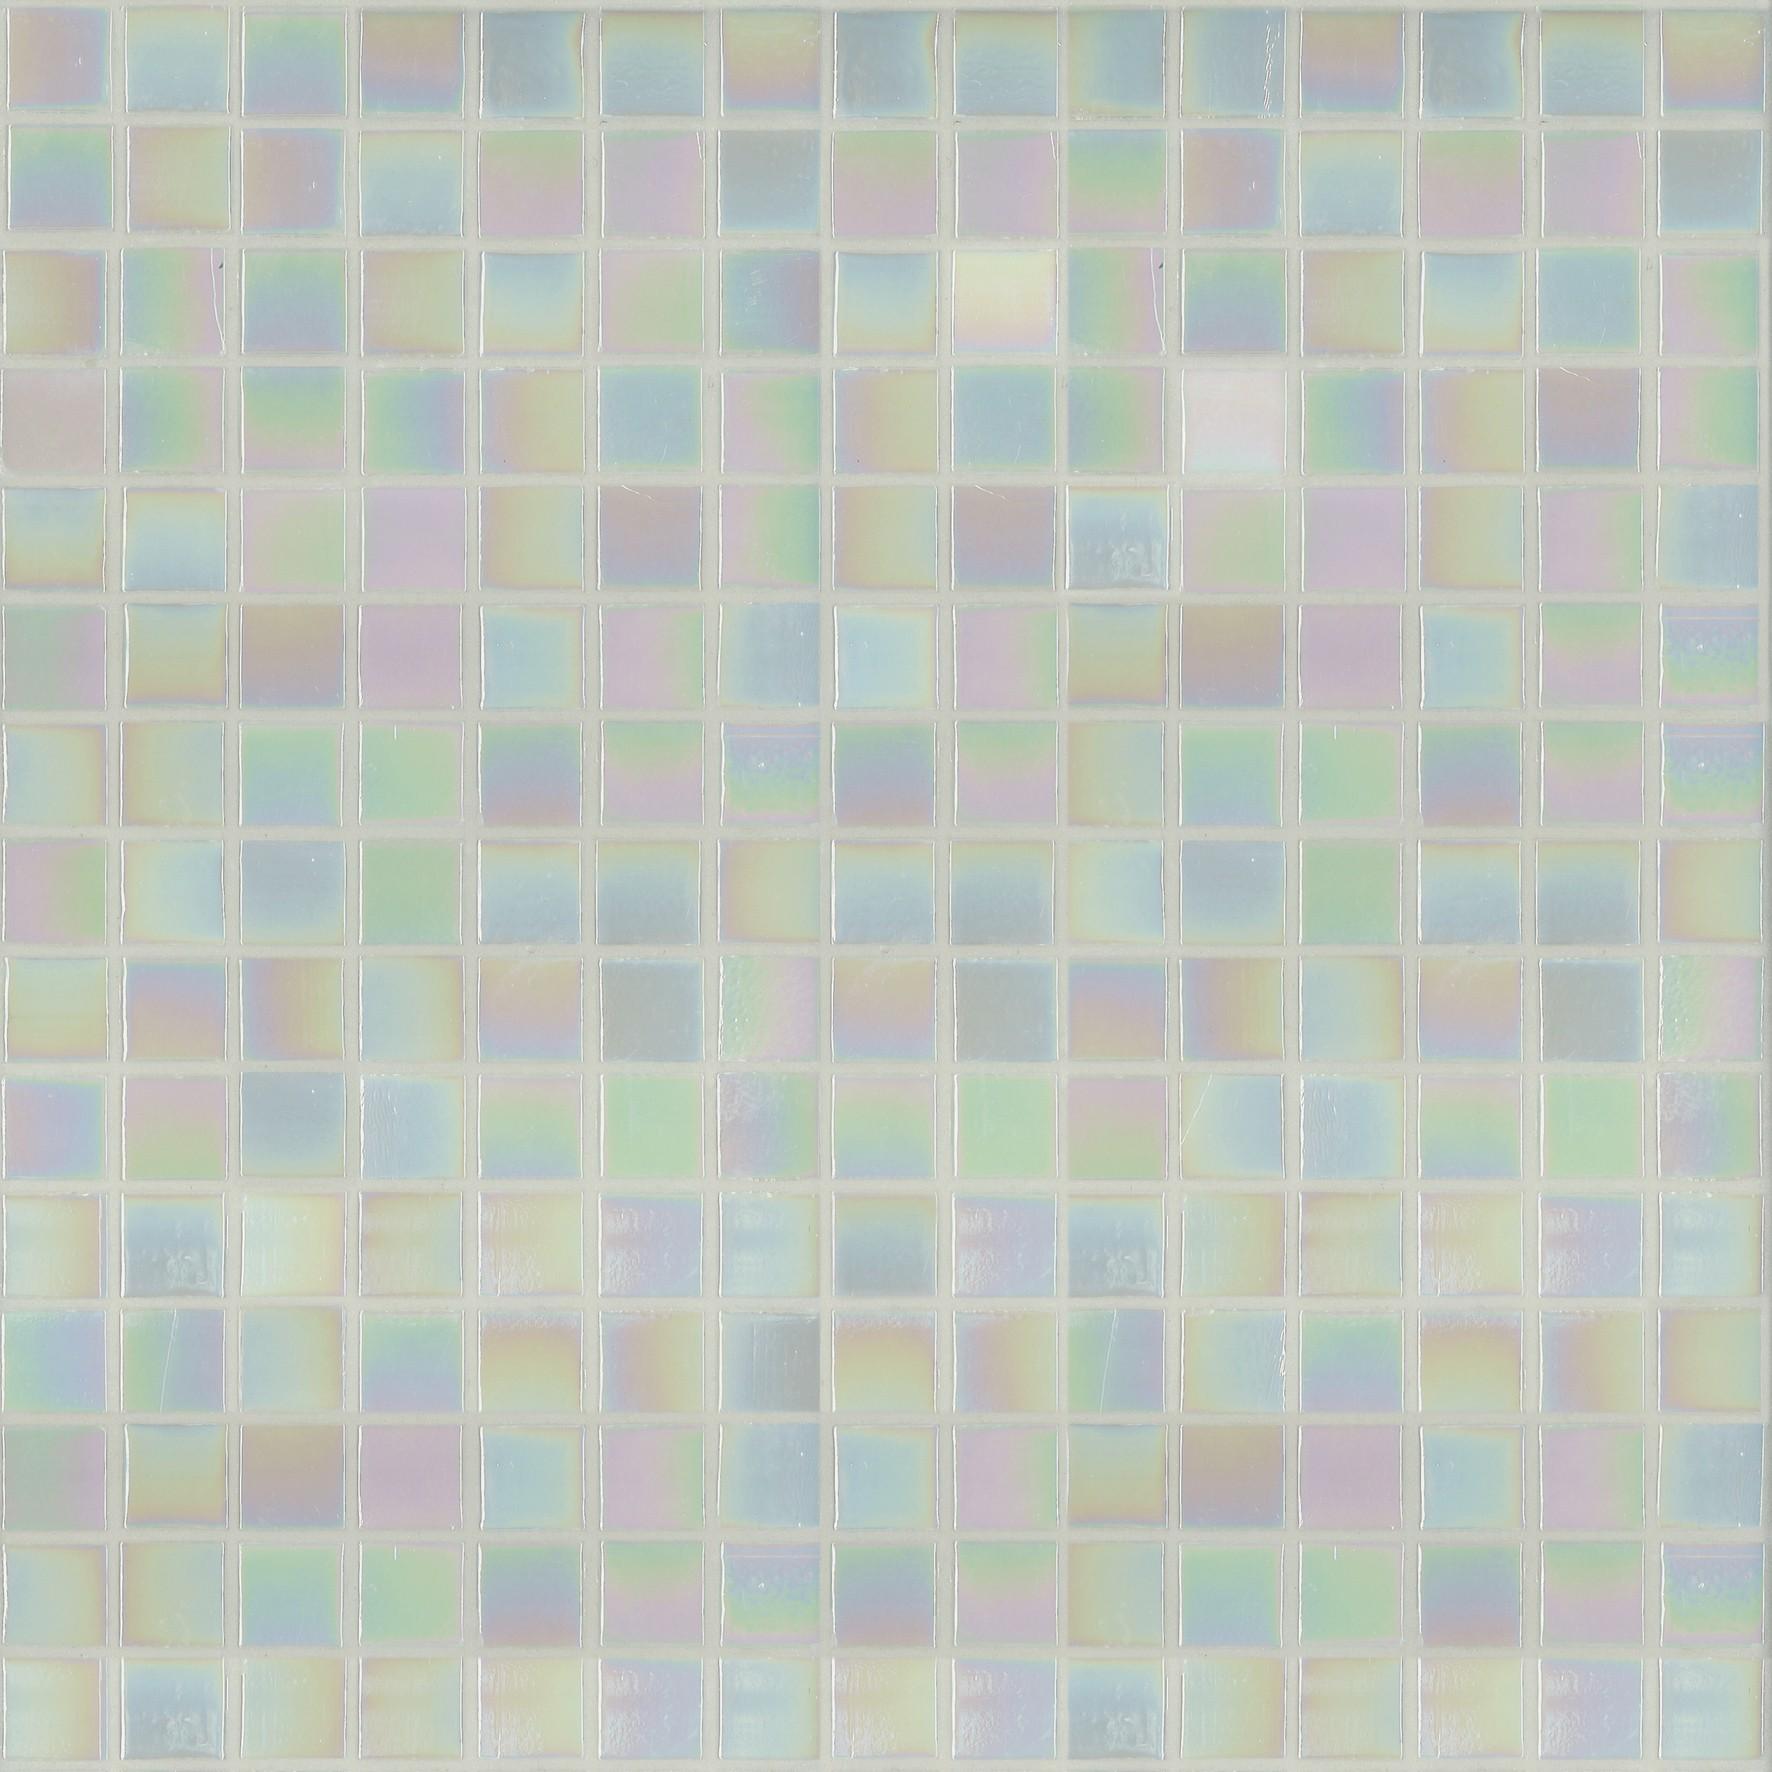 Bisazza Gloss Gl 12 Mosaic Tile 20mm 3 4 20 Sheets